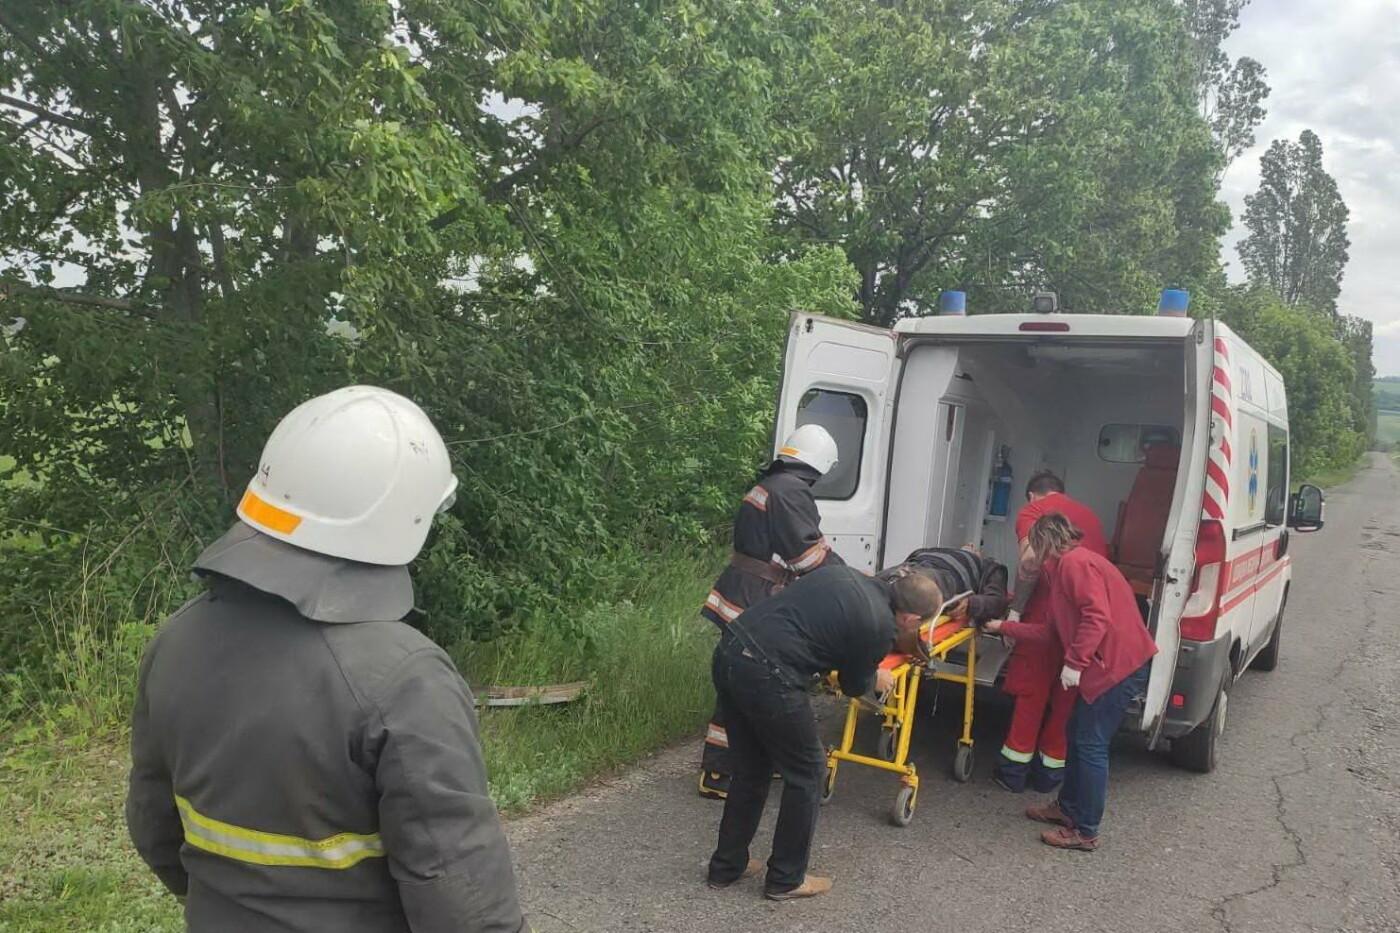 На Харьковщине рейсовый автобус съехал в кювет и «влетел» в дерево: водителя доставали спасатели, - ФОТО, фото-2